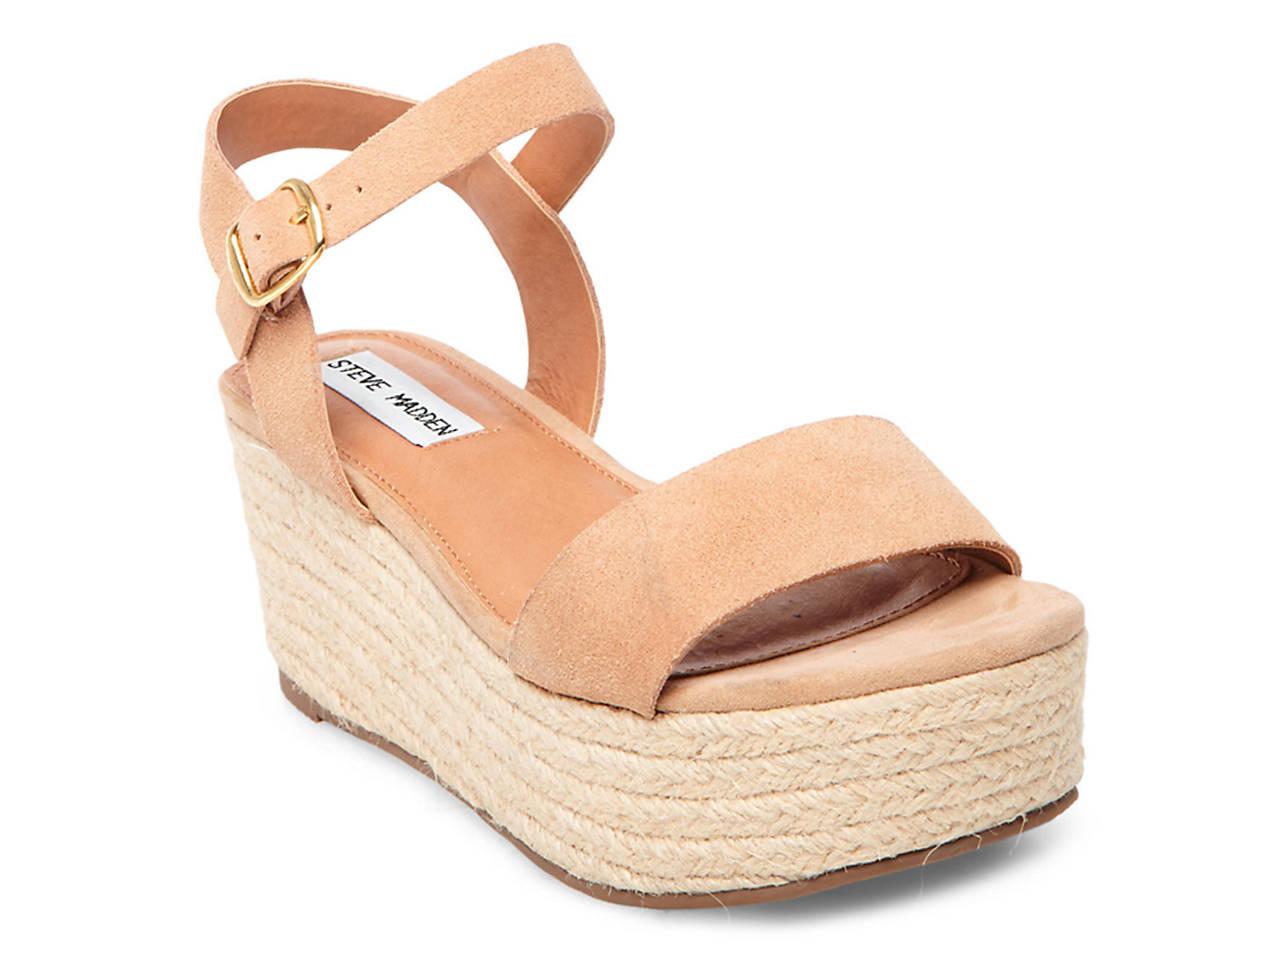 Steve Madden Busy Flatform Sandal (Women's) mdcX6OvYGO